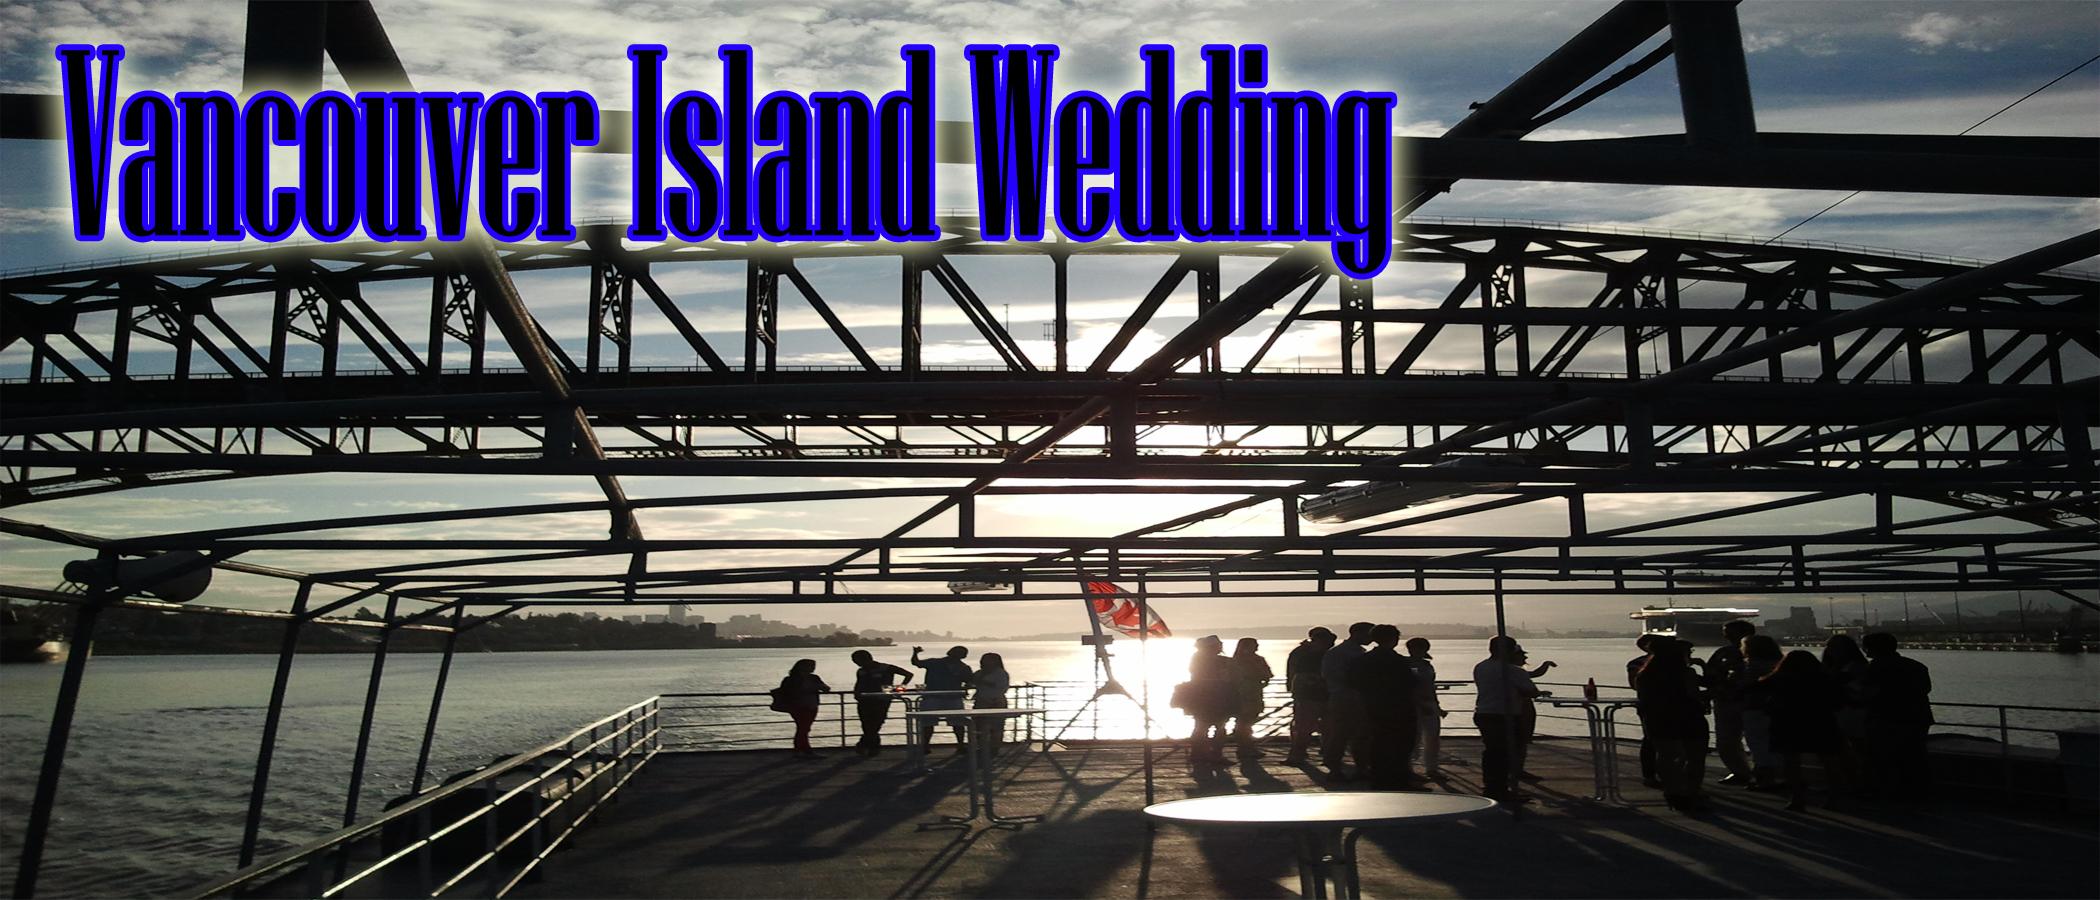 Wedding Dj Vancouver Island